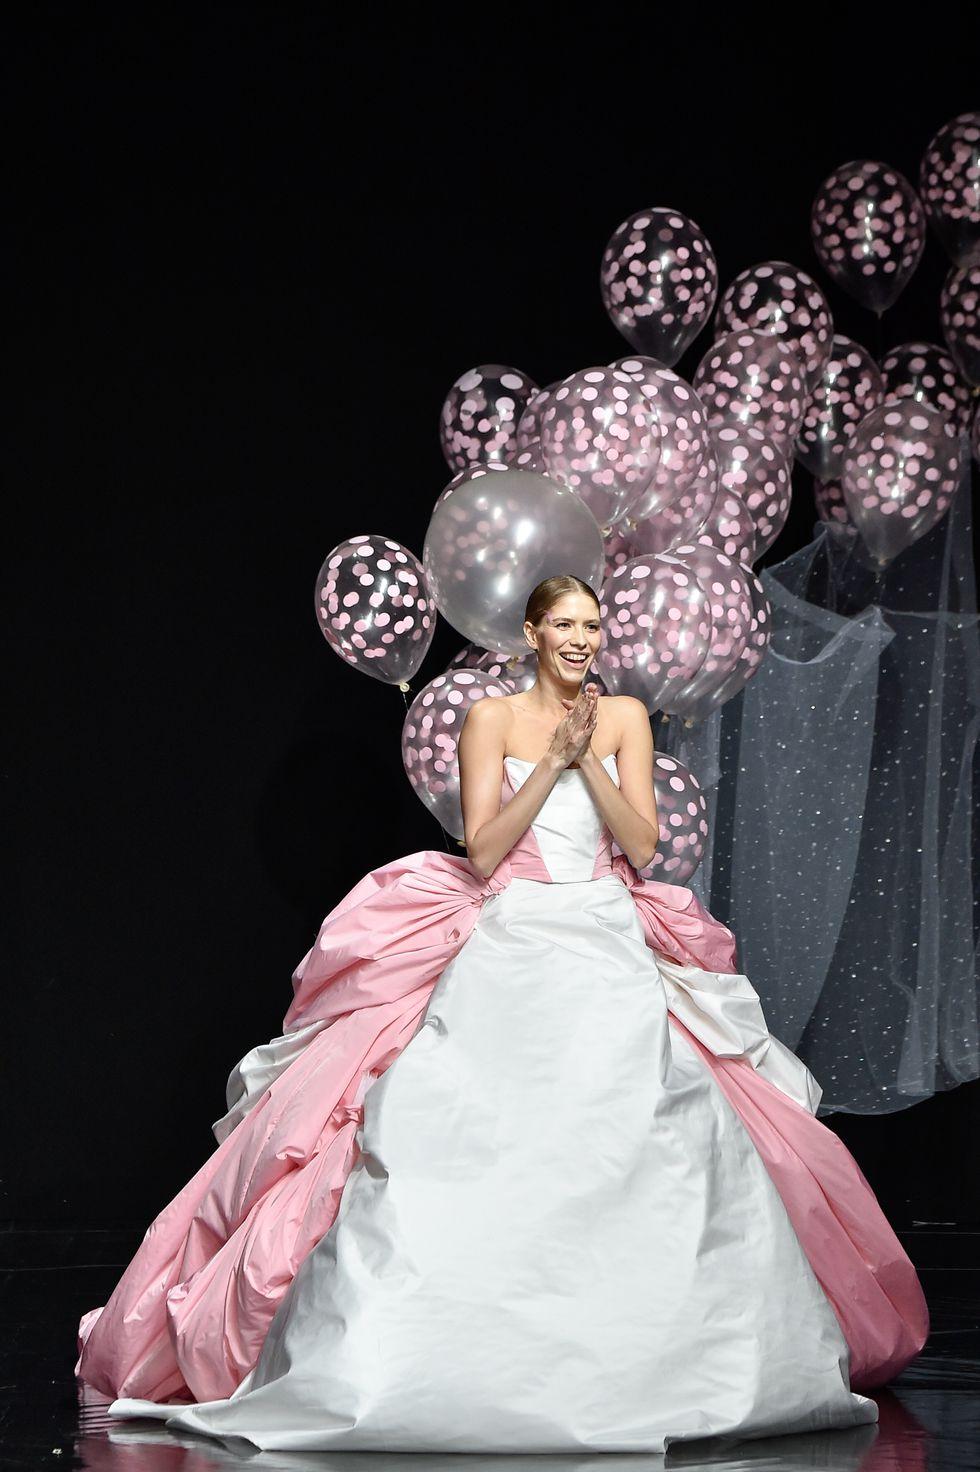 celia kritharioti paris haute couture fashion week runway 1548584270 - Best of Haute Couture Week Part-II